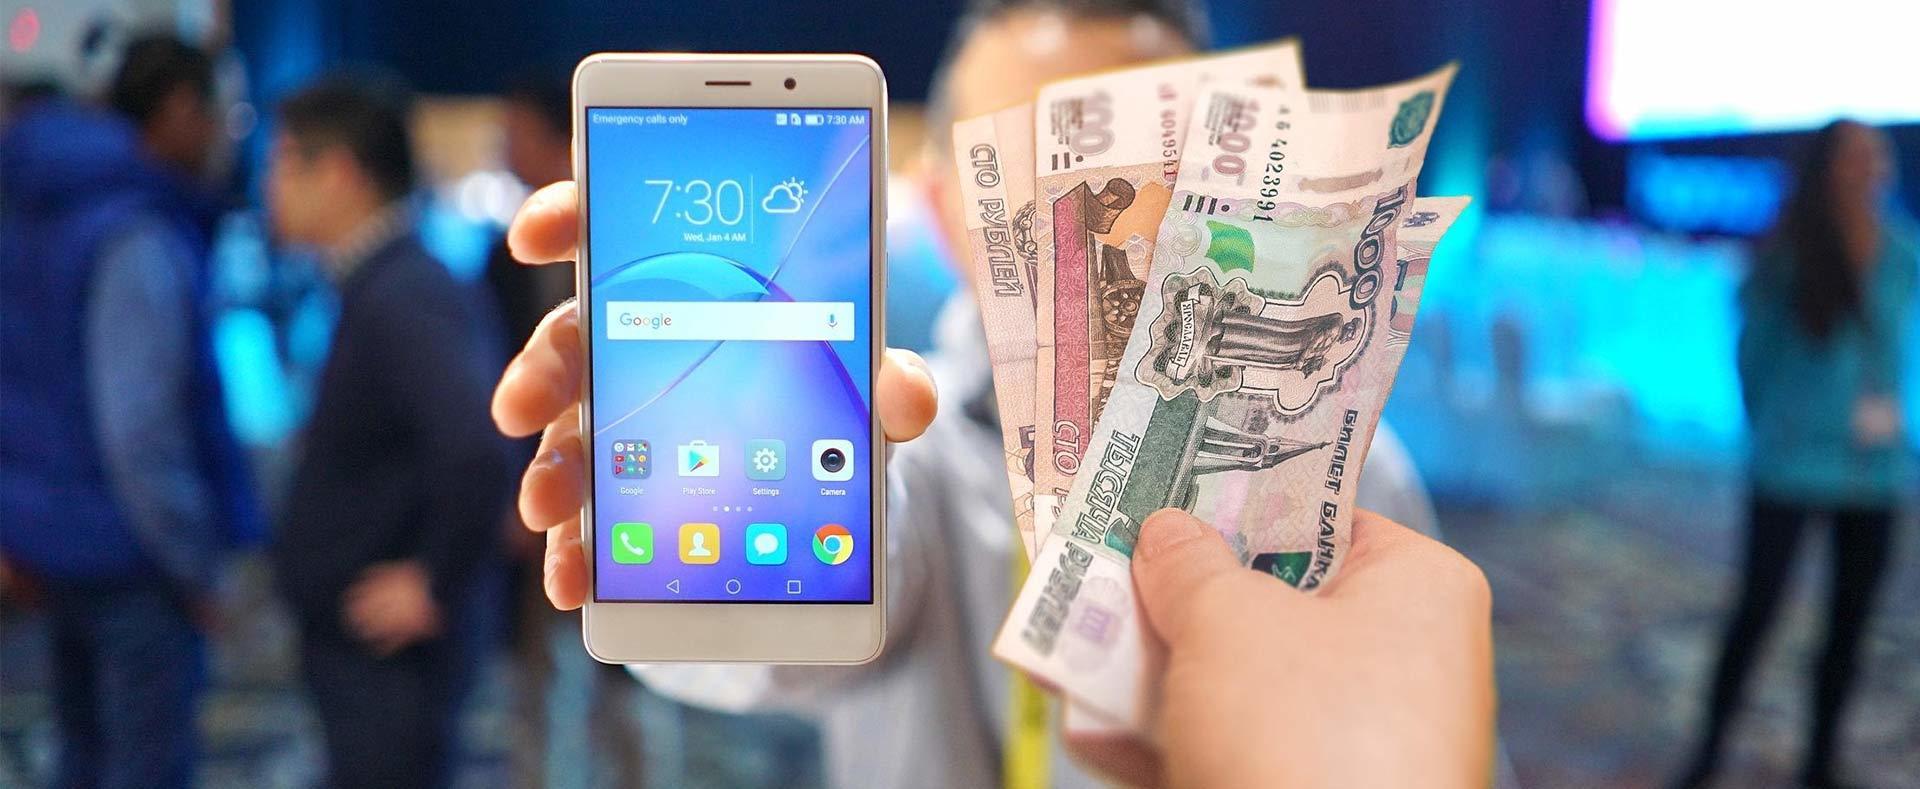 Смартфон до 10000 рублей в 2017 году? Легко!